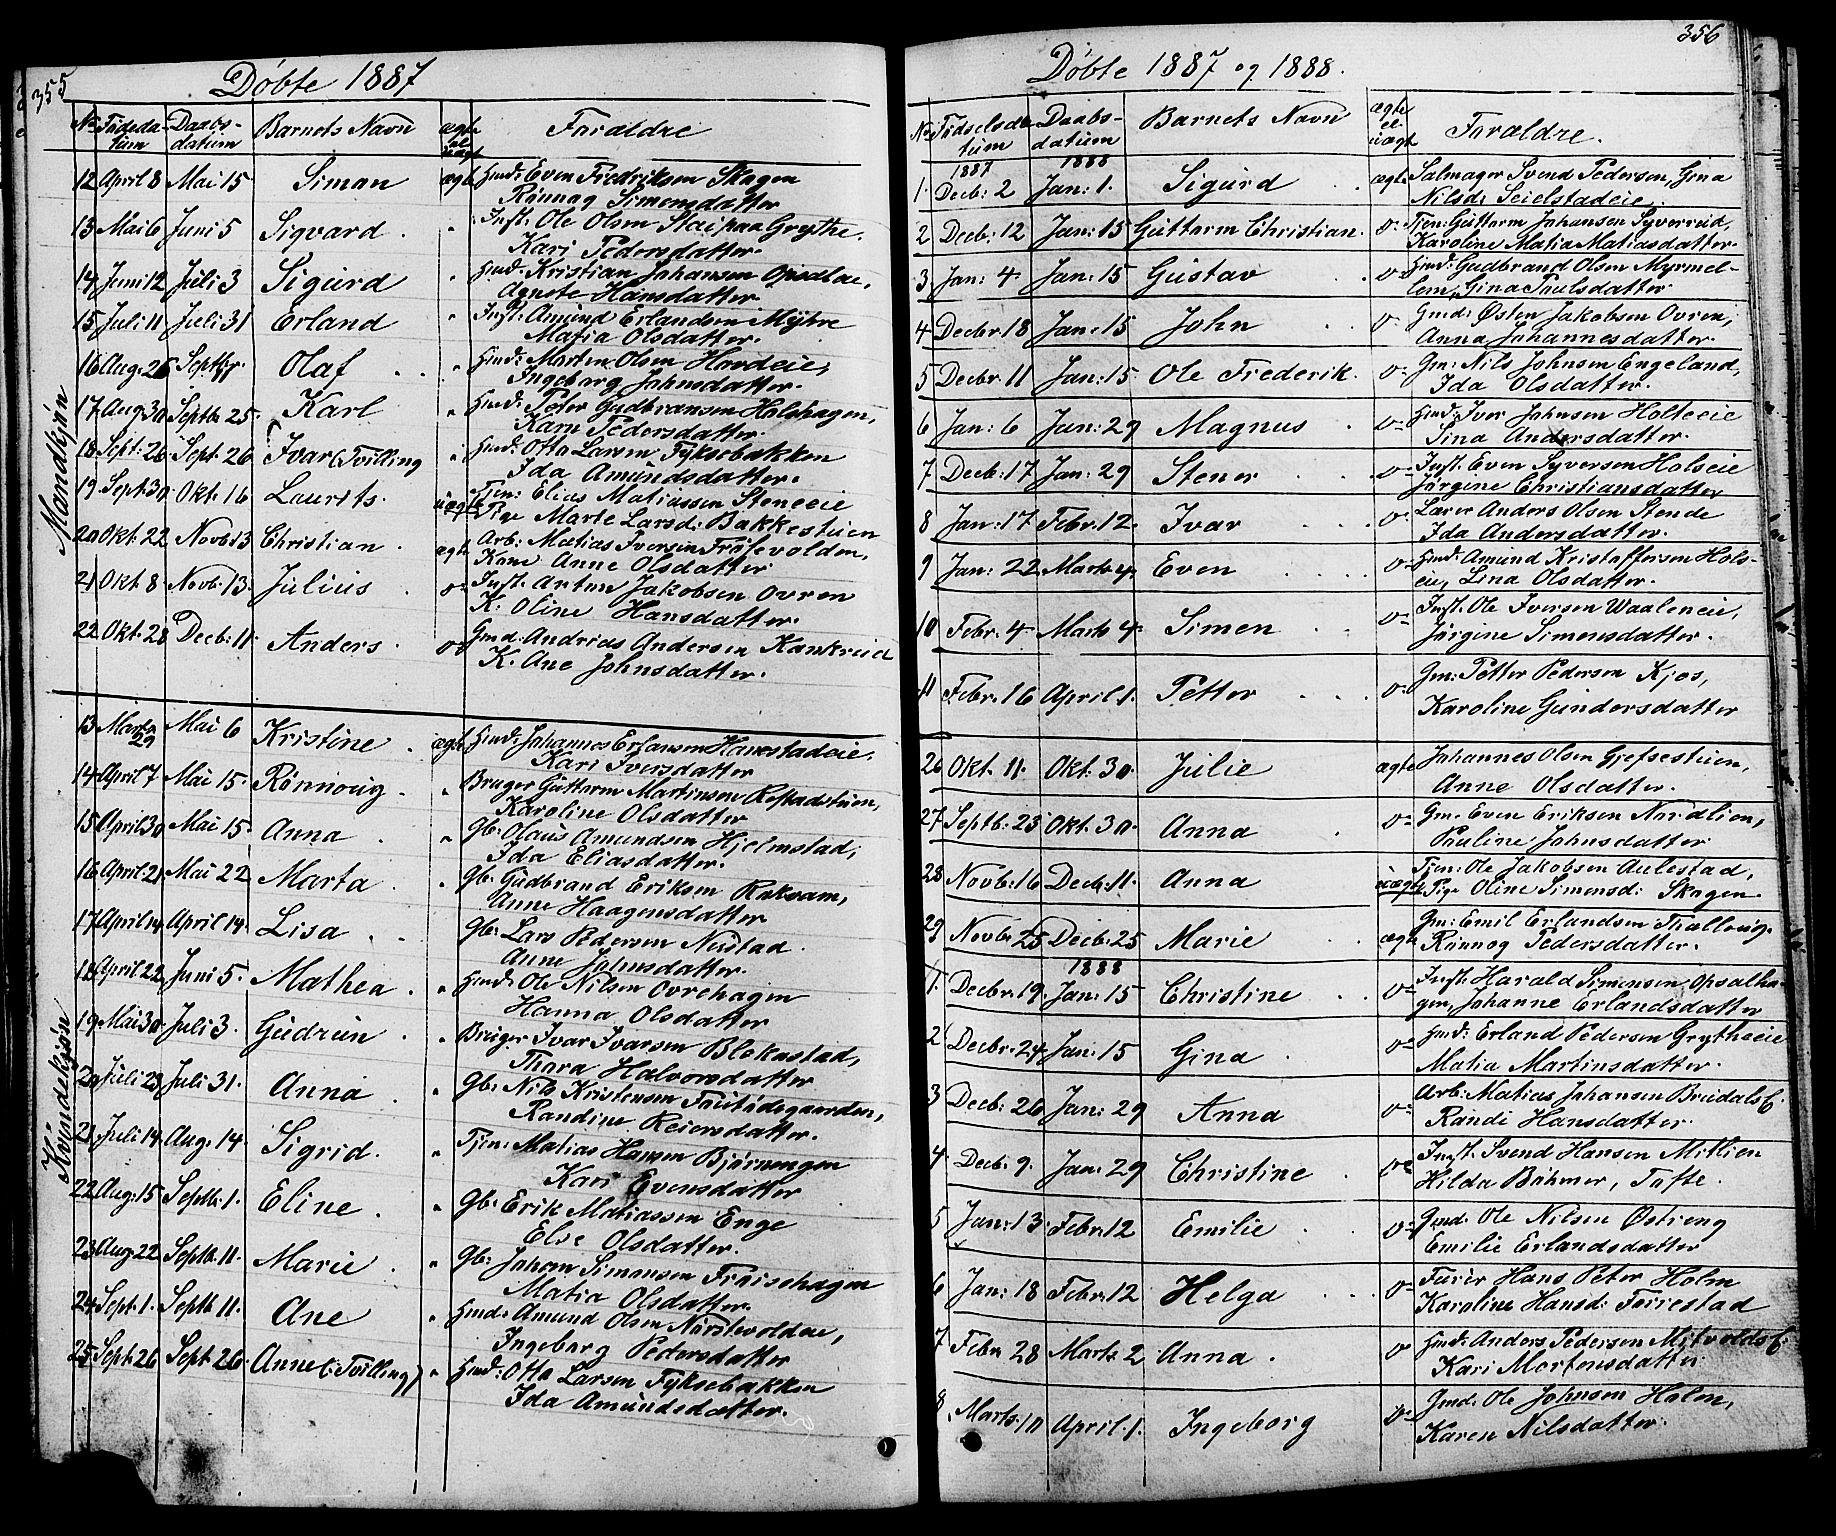 SAH, Østre Gausdal prestekontor, Klokkerbok nr. 1, 1863-1893, s. 355-356